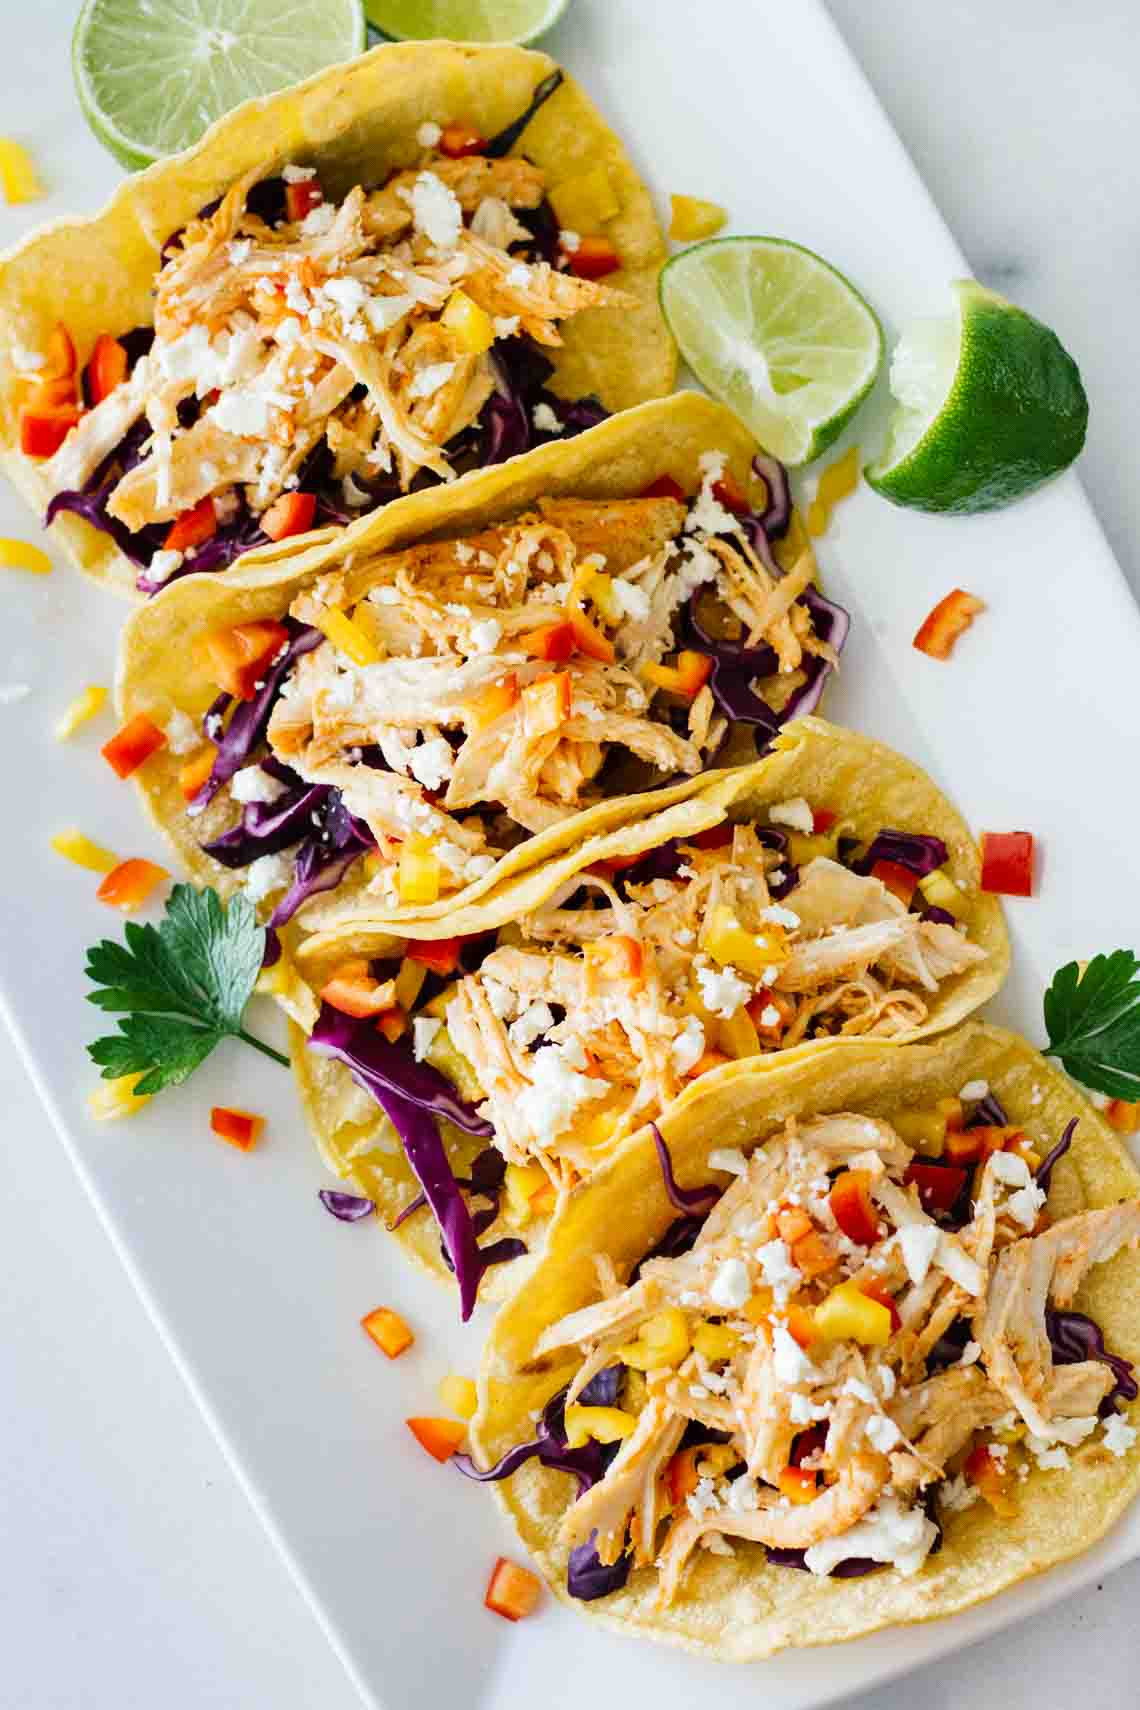 Healthy Dinner Meals  Healthy Sriracha Shredded Chicken Tacos Jar Lemons